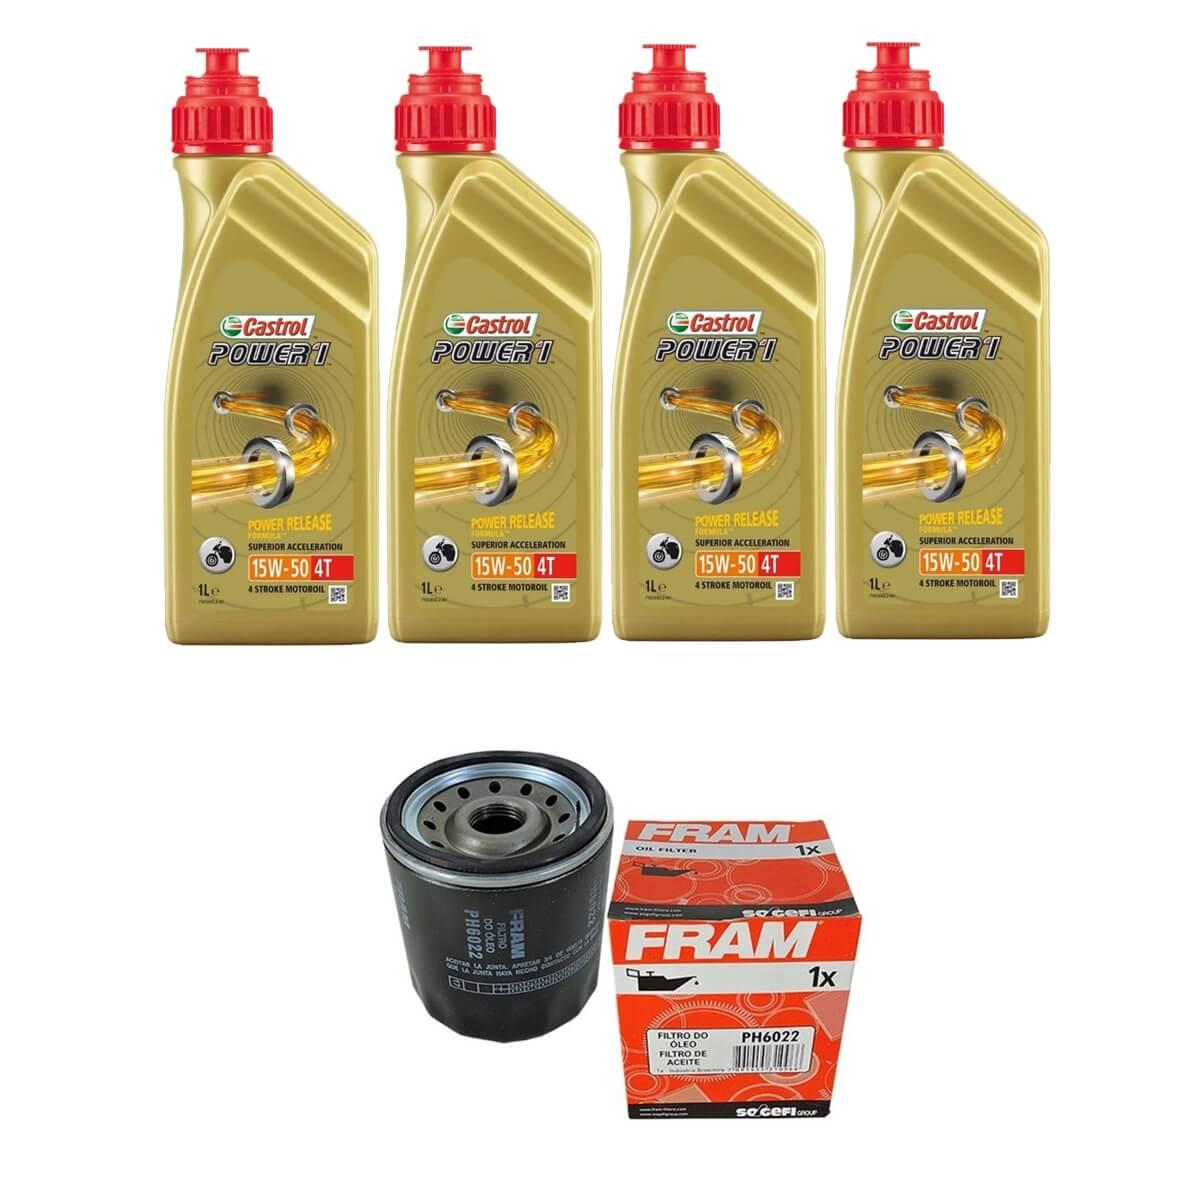 Kit Troca de Oleo Castrol Power 1 15w50 4lt + Filtro Fram PH6022